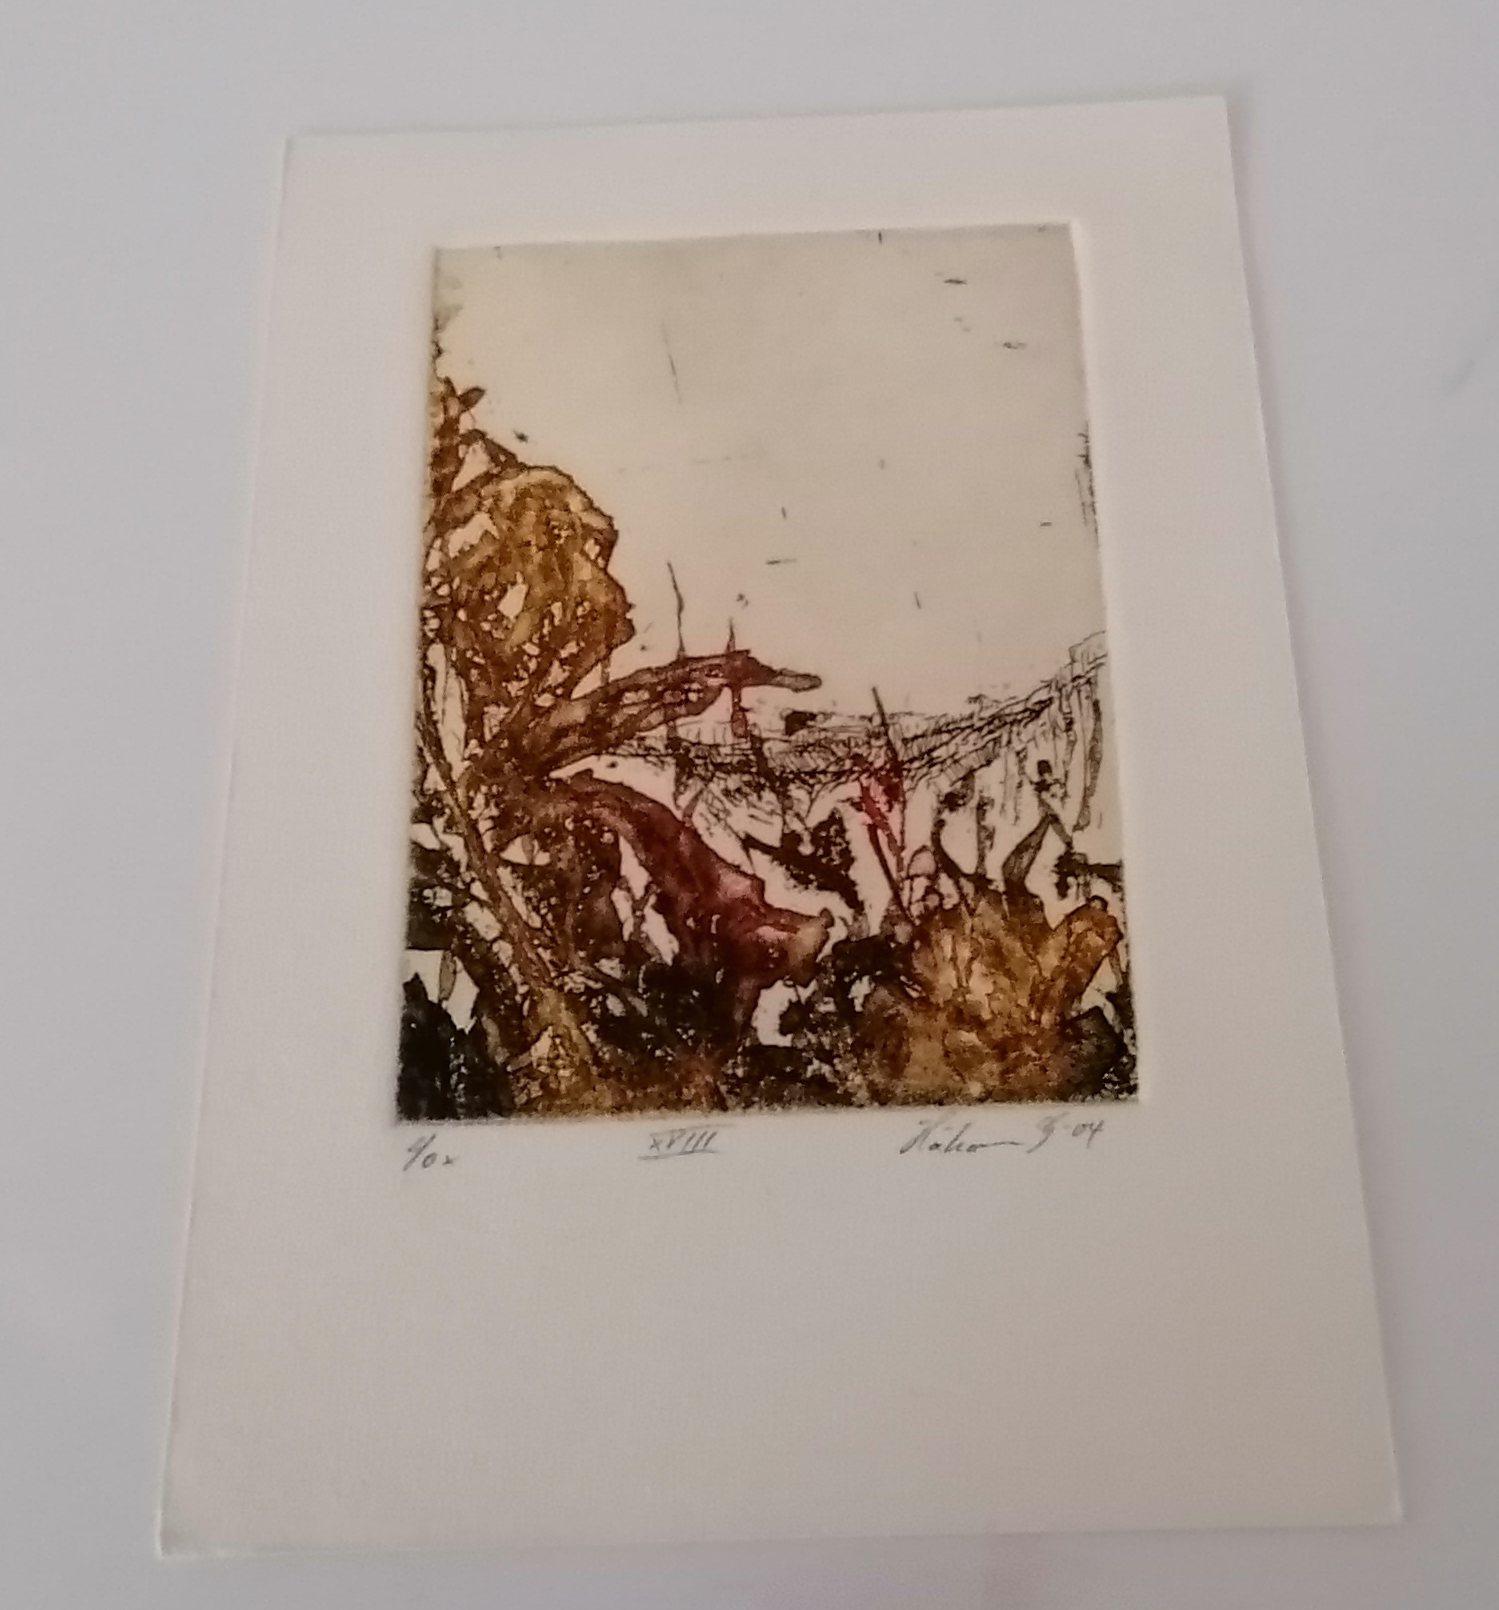 https://www.norstamps.com/content/images/stamps/gtgallerier/198.jpg